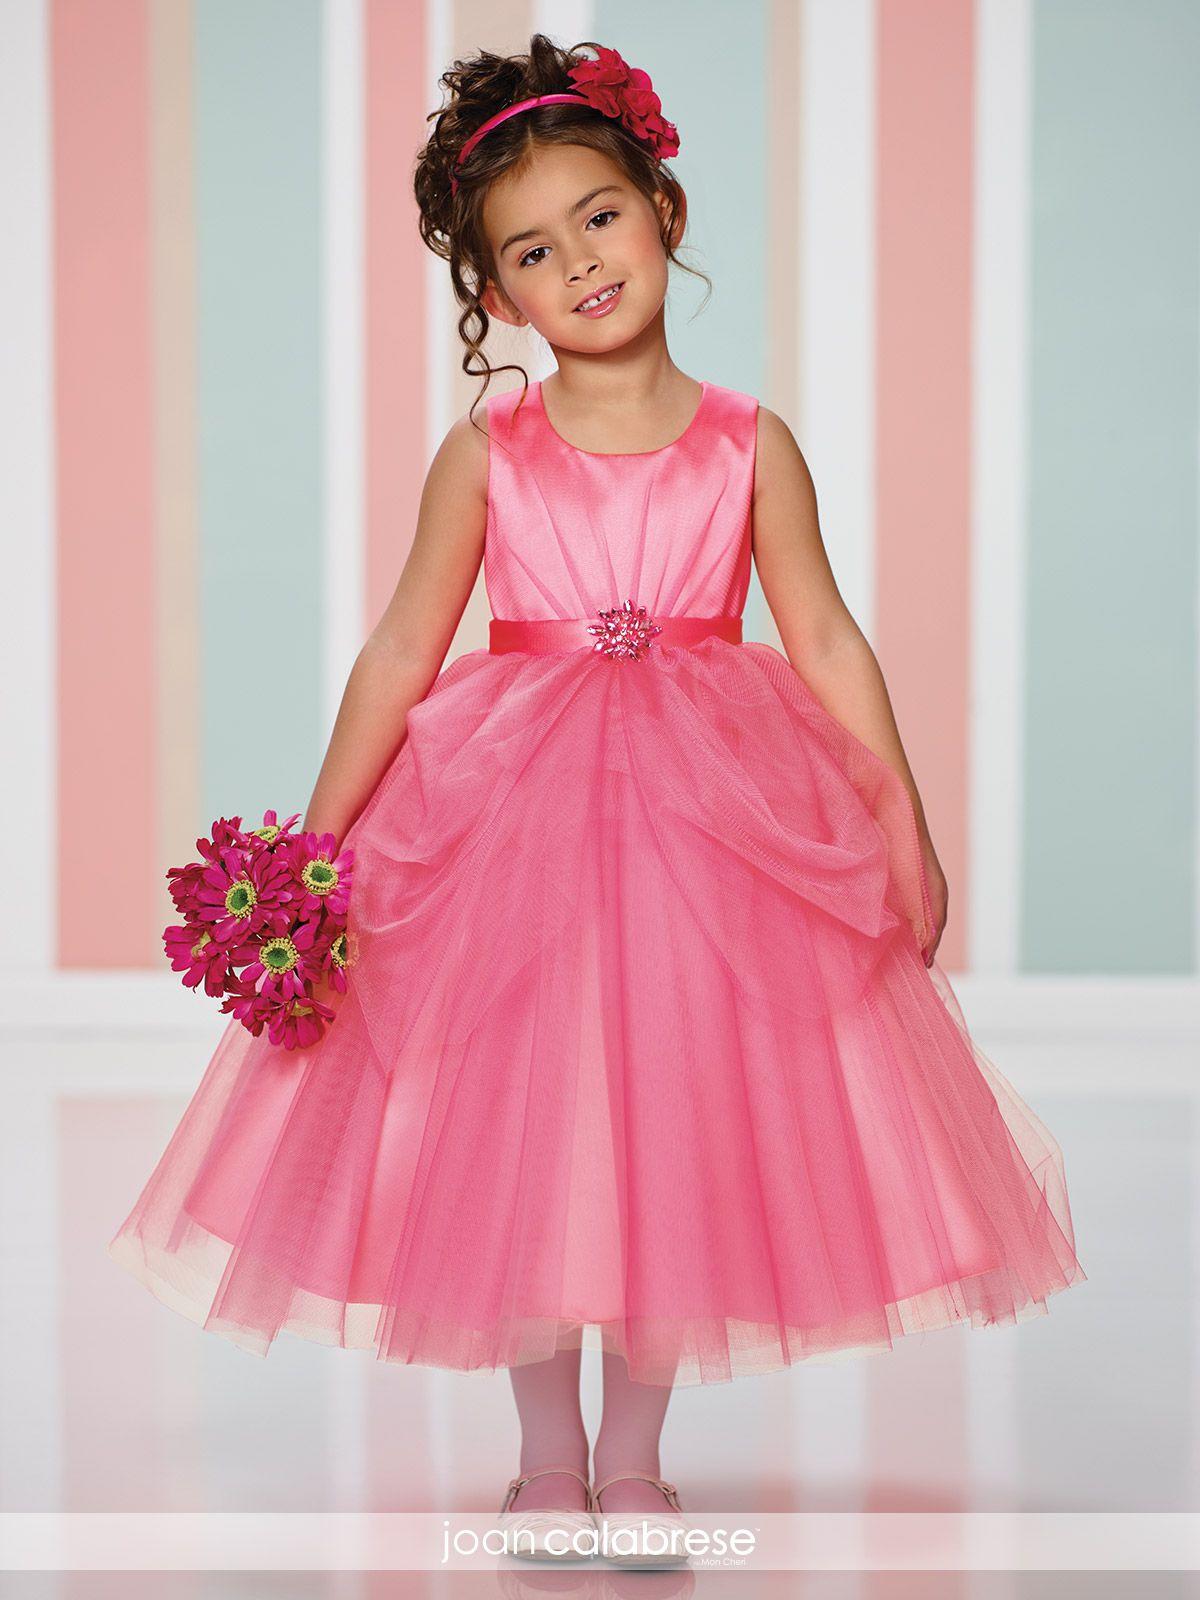 Joan Calabrese Flower Girl Dresses | Niños pequeños, Vestidos ...